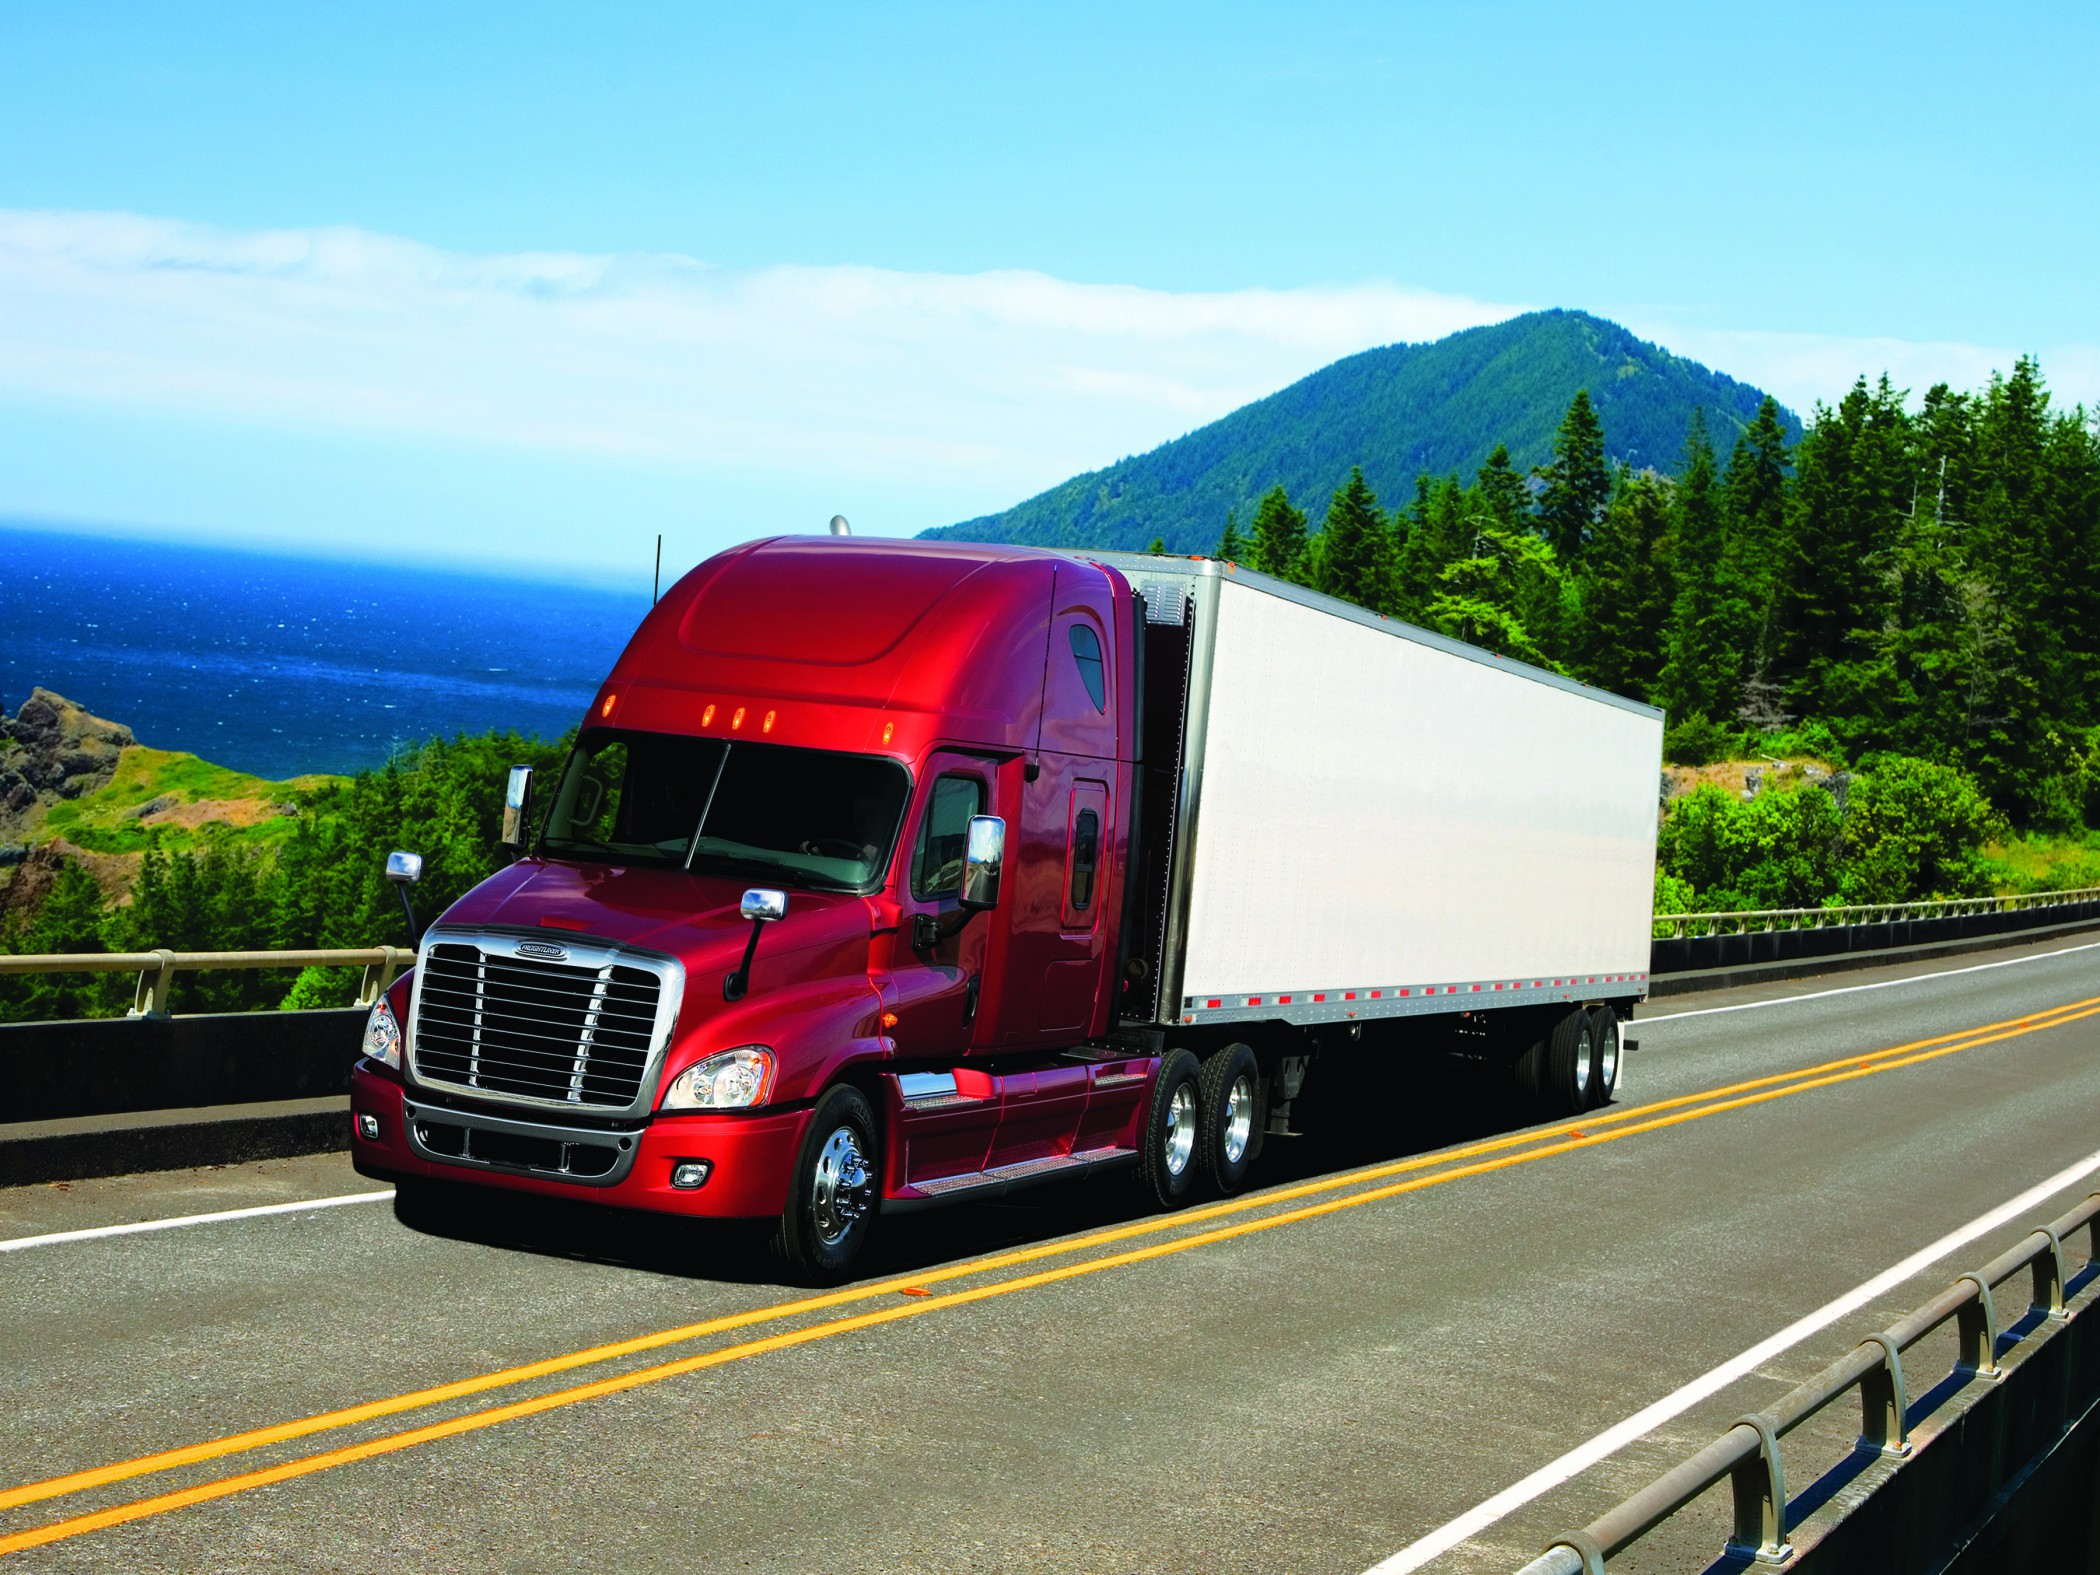 Establish Dedicated Contract Carriage KPIs